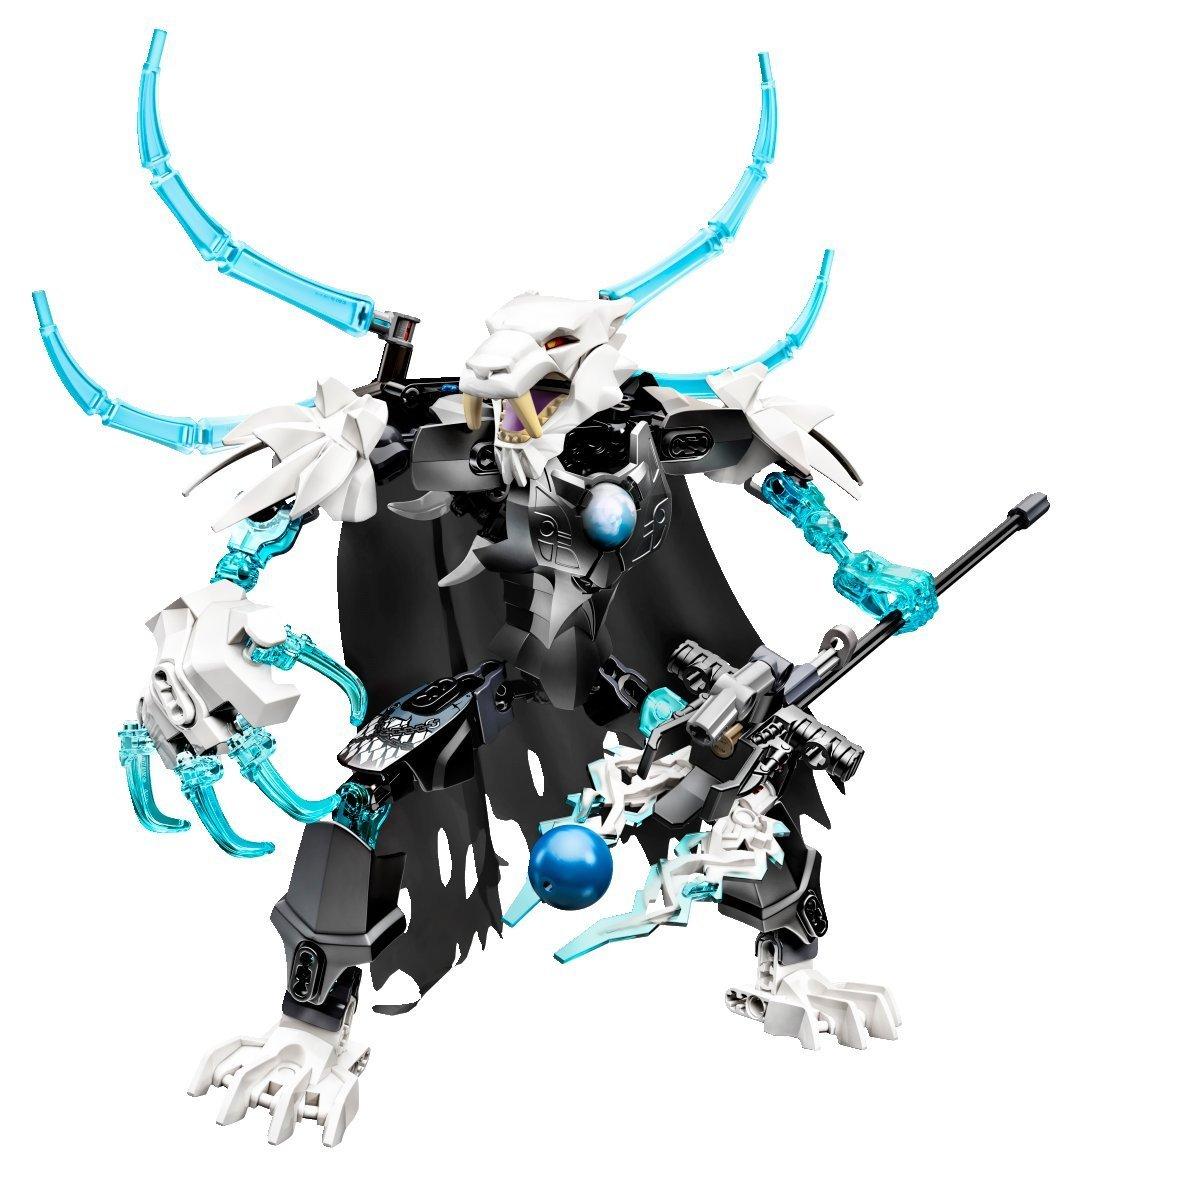 70212 chi sir fangar wiki lego fandom powered by wikia - Lego chima saison 2 ...